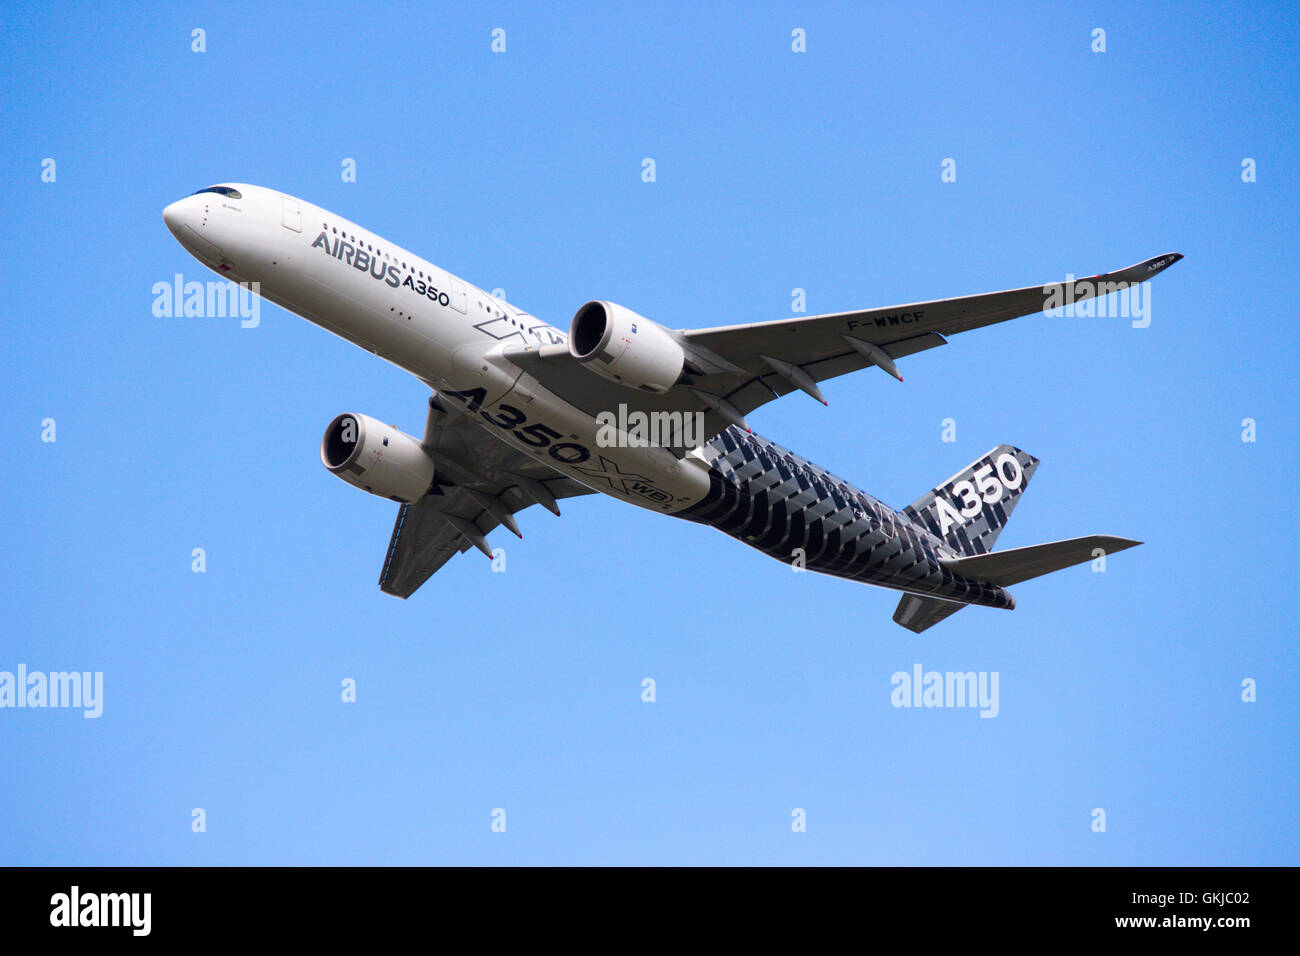 Airbus A350 taking off at Farnborough UK - Stock Image